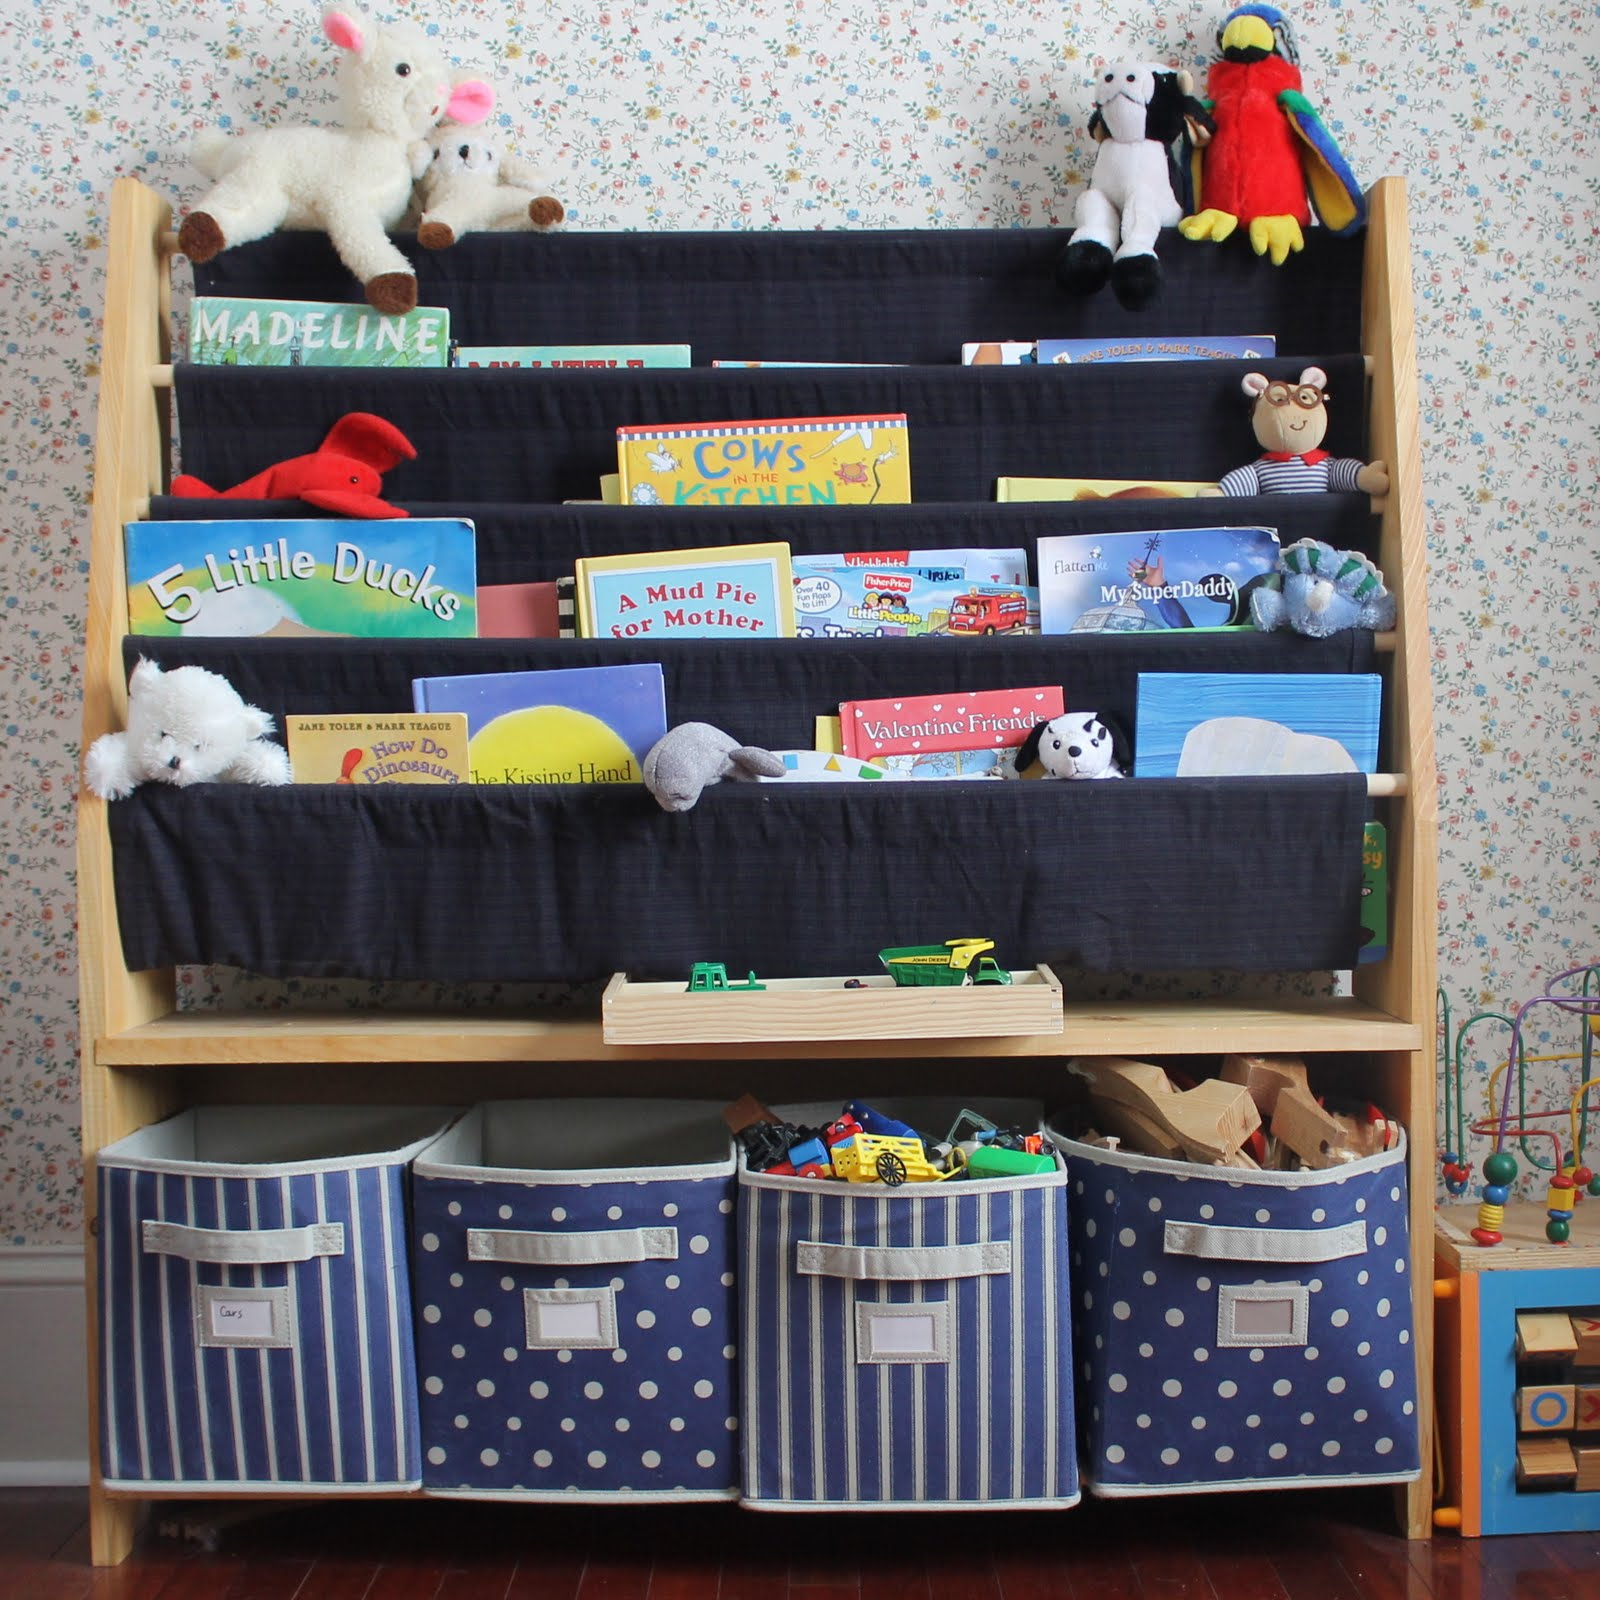 born imaginative.: Sling Bookshelf with Storage Bins for Kids